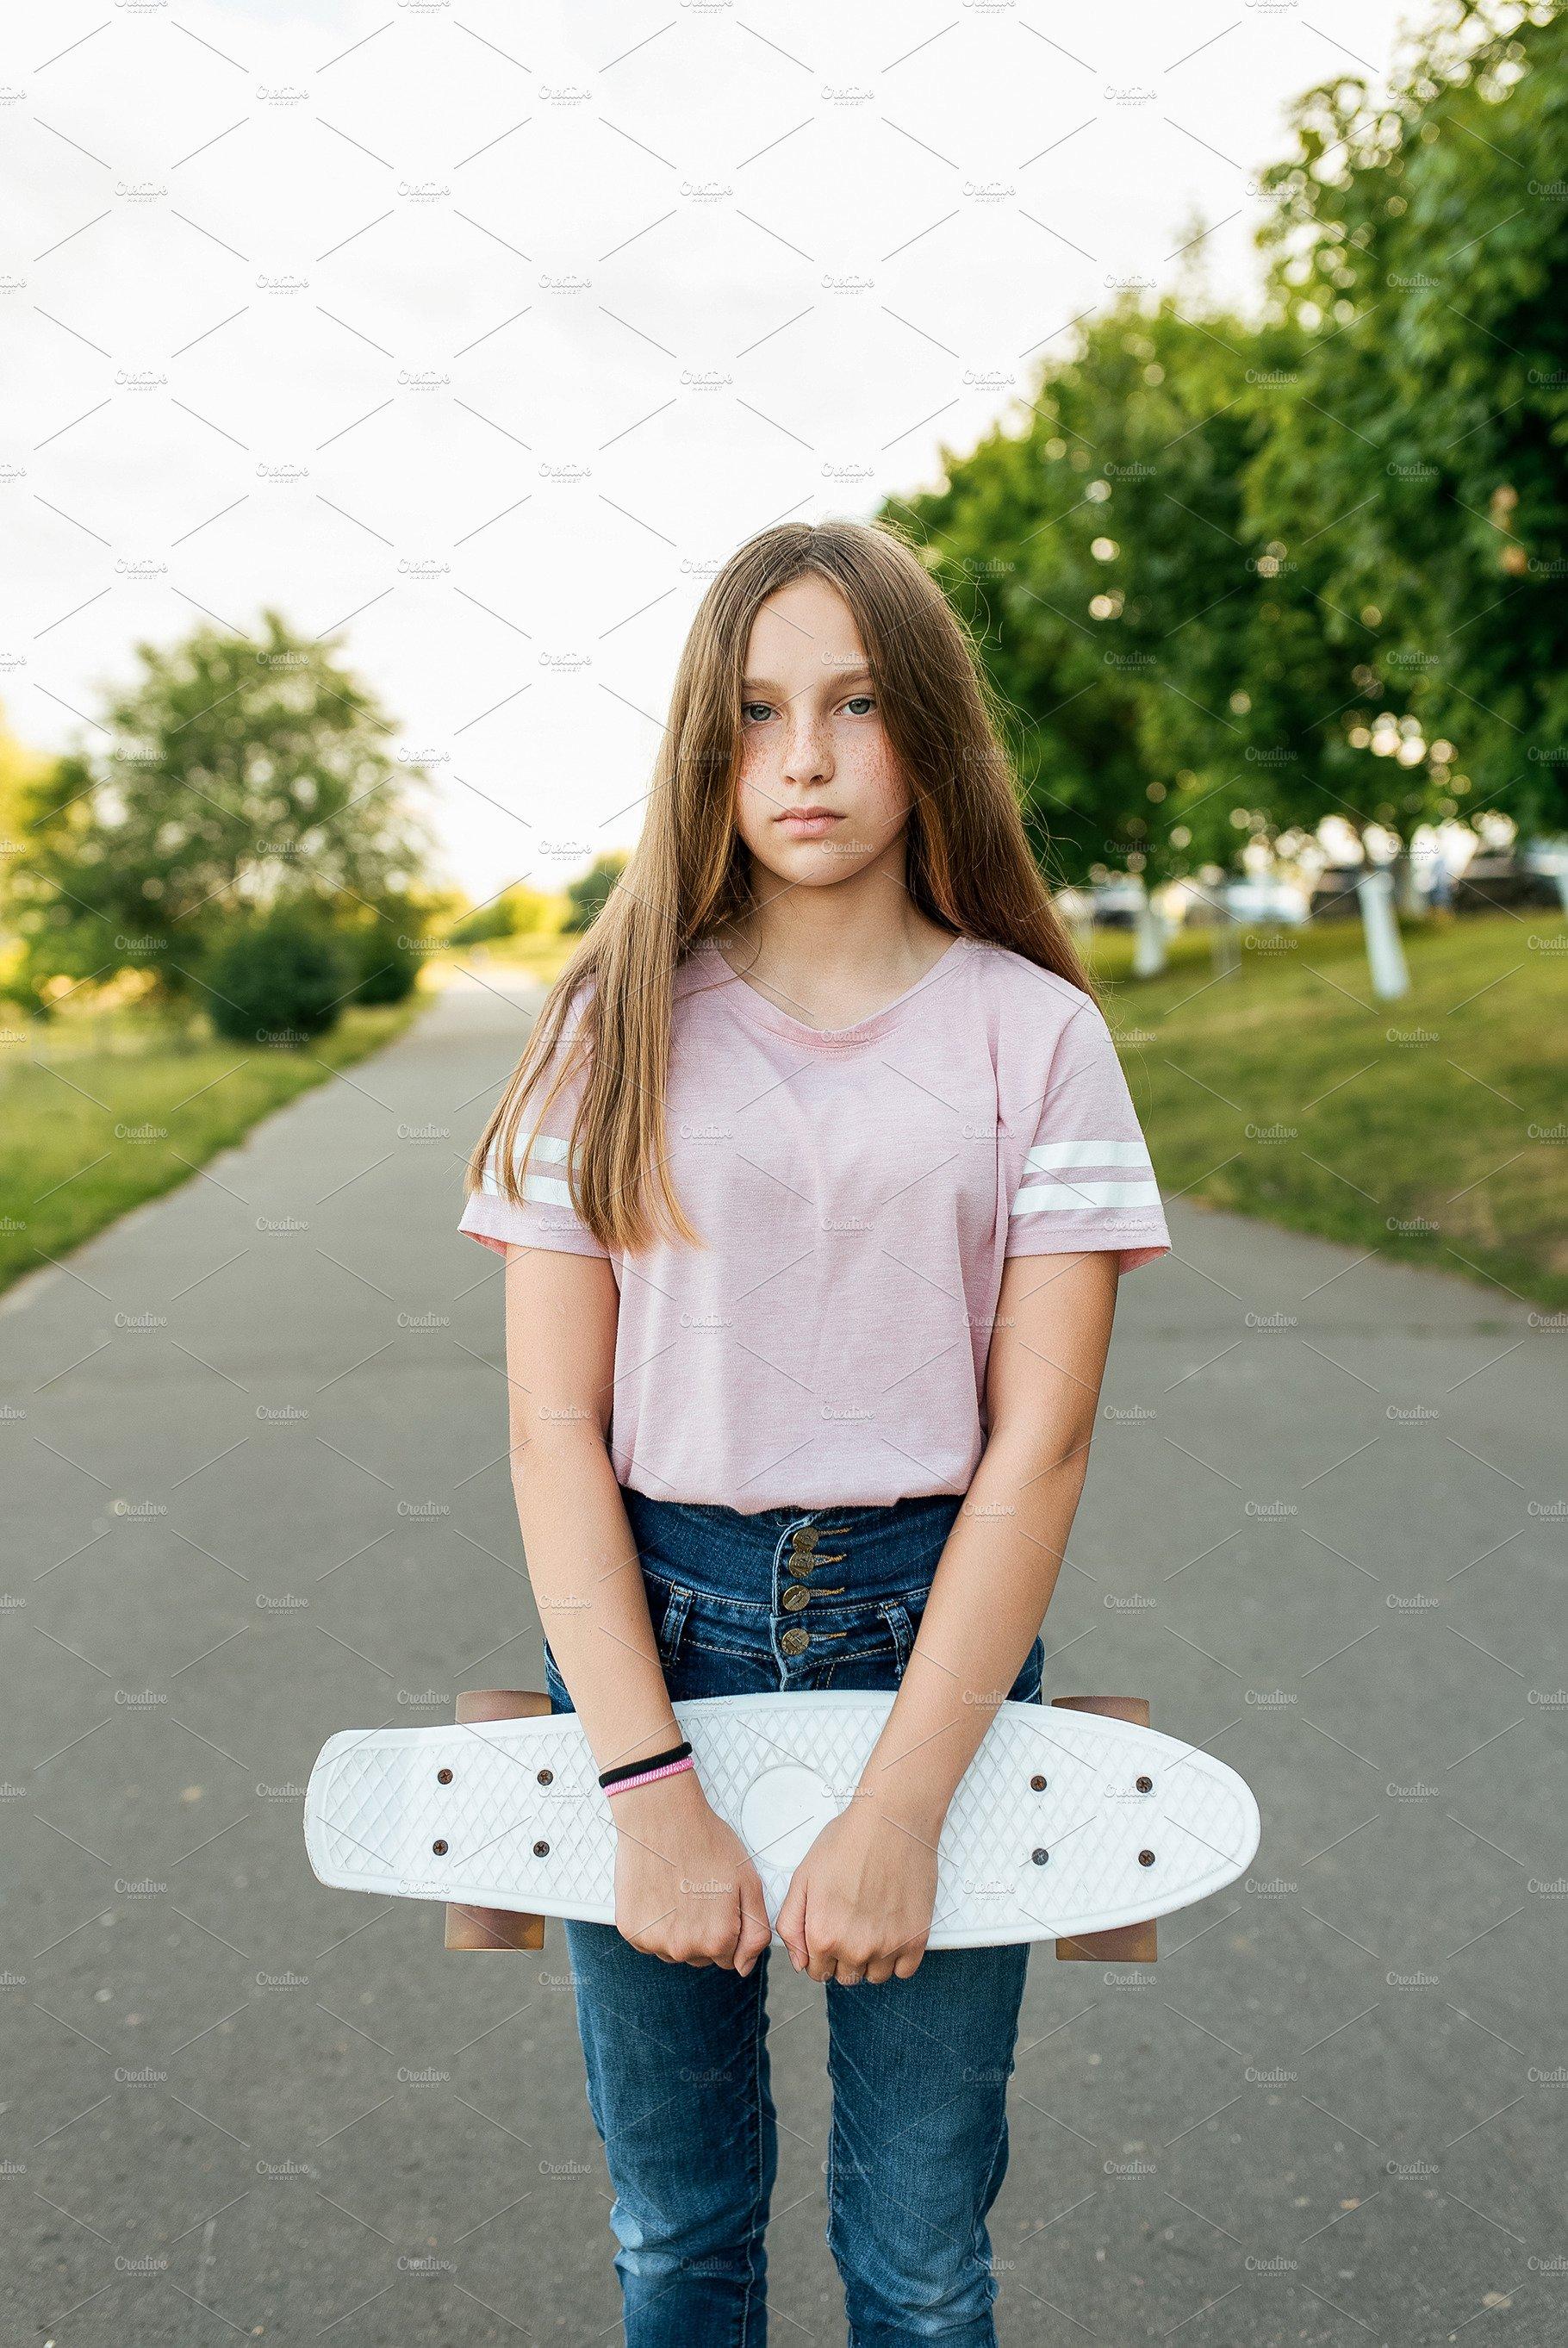 Outdoor portrait of young girl - 54ka [photo blog]